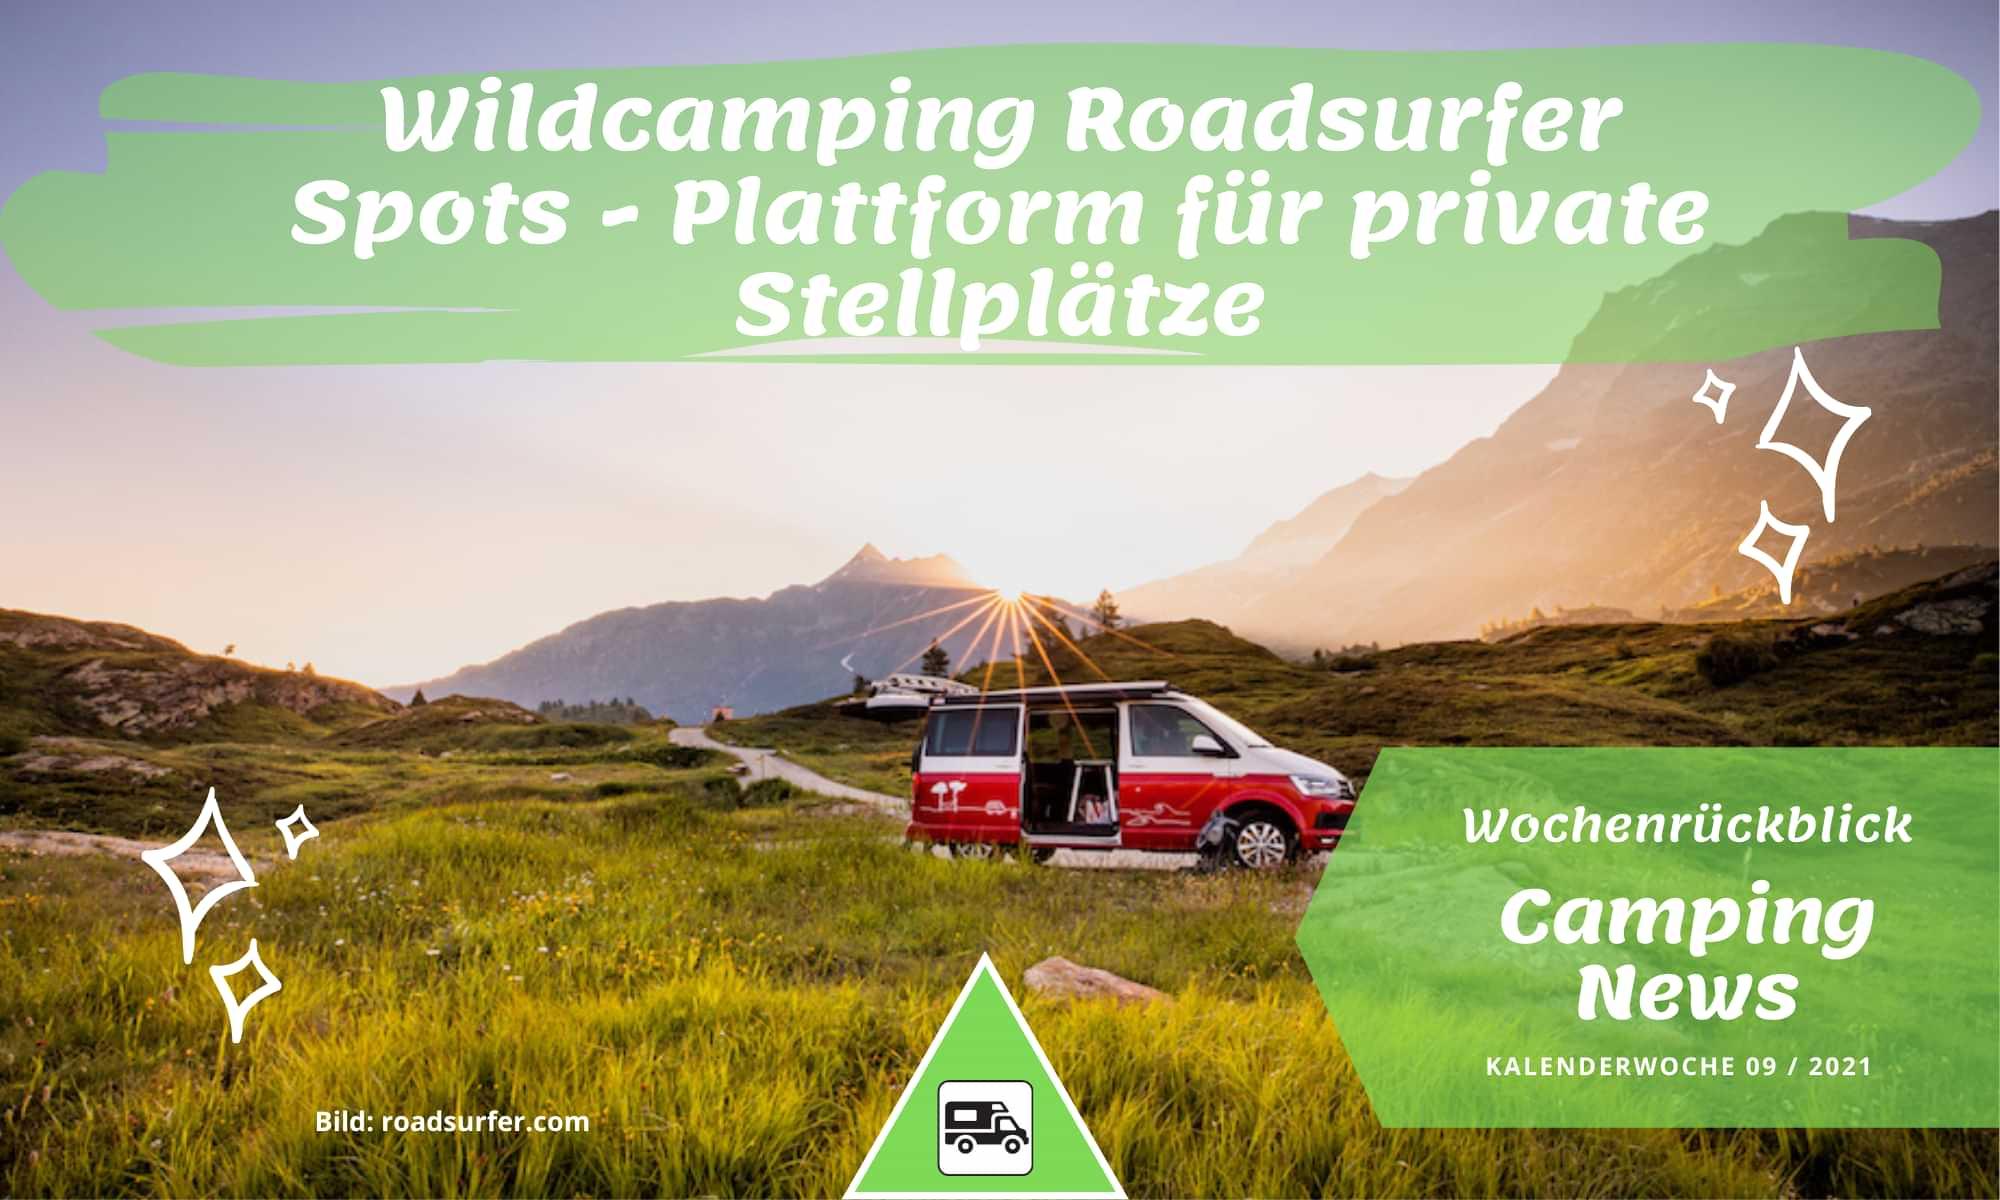 Wildcamping ganz legal mit Roadsurfer